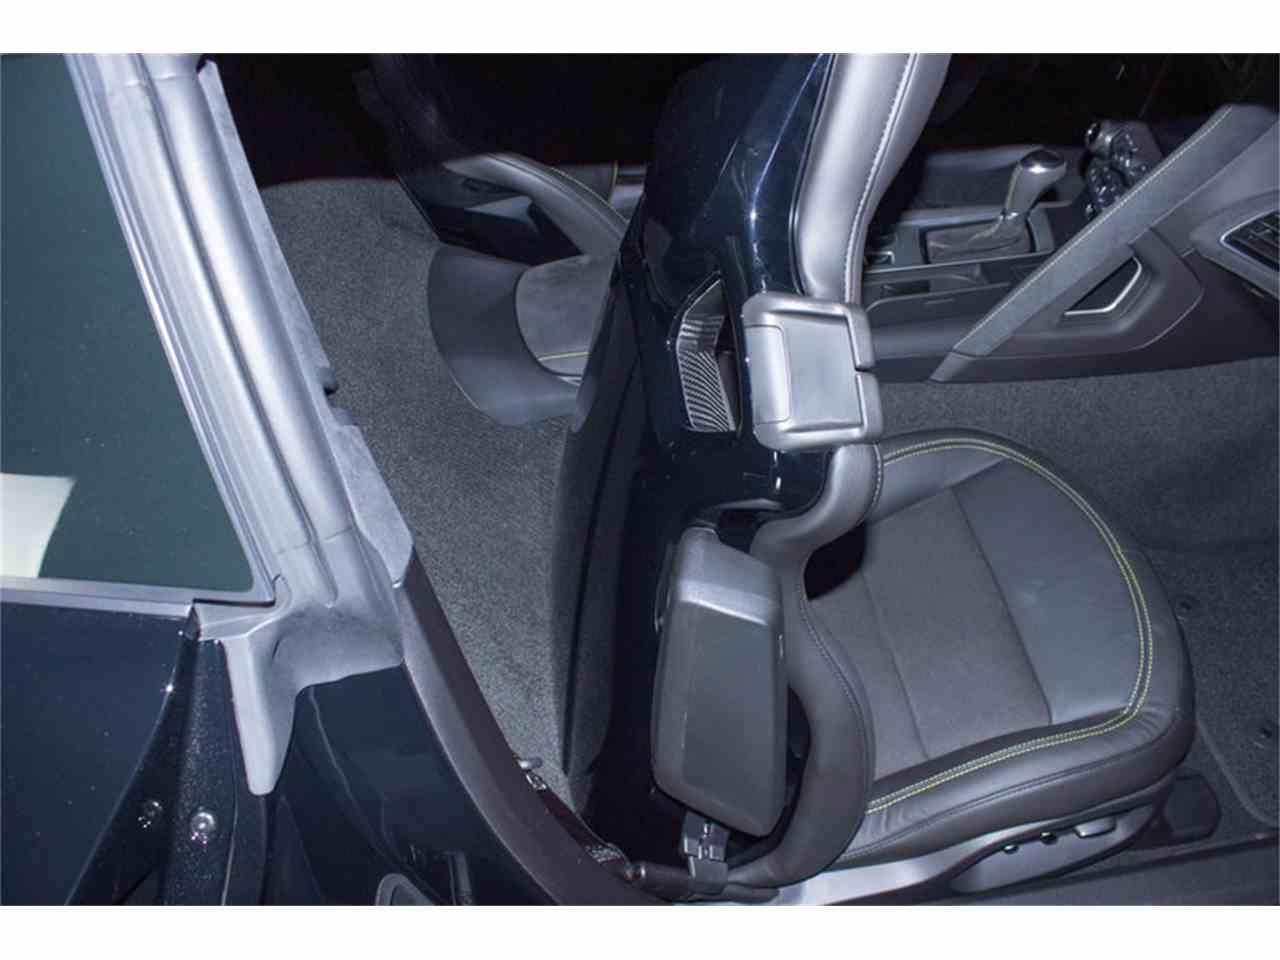 Large Picture of '16 Chevrolet Corvette Z06 located in Palmetto Florida - $99,997.00 - M7FW